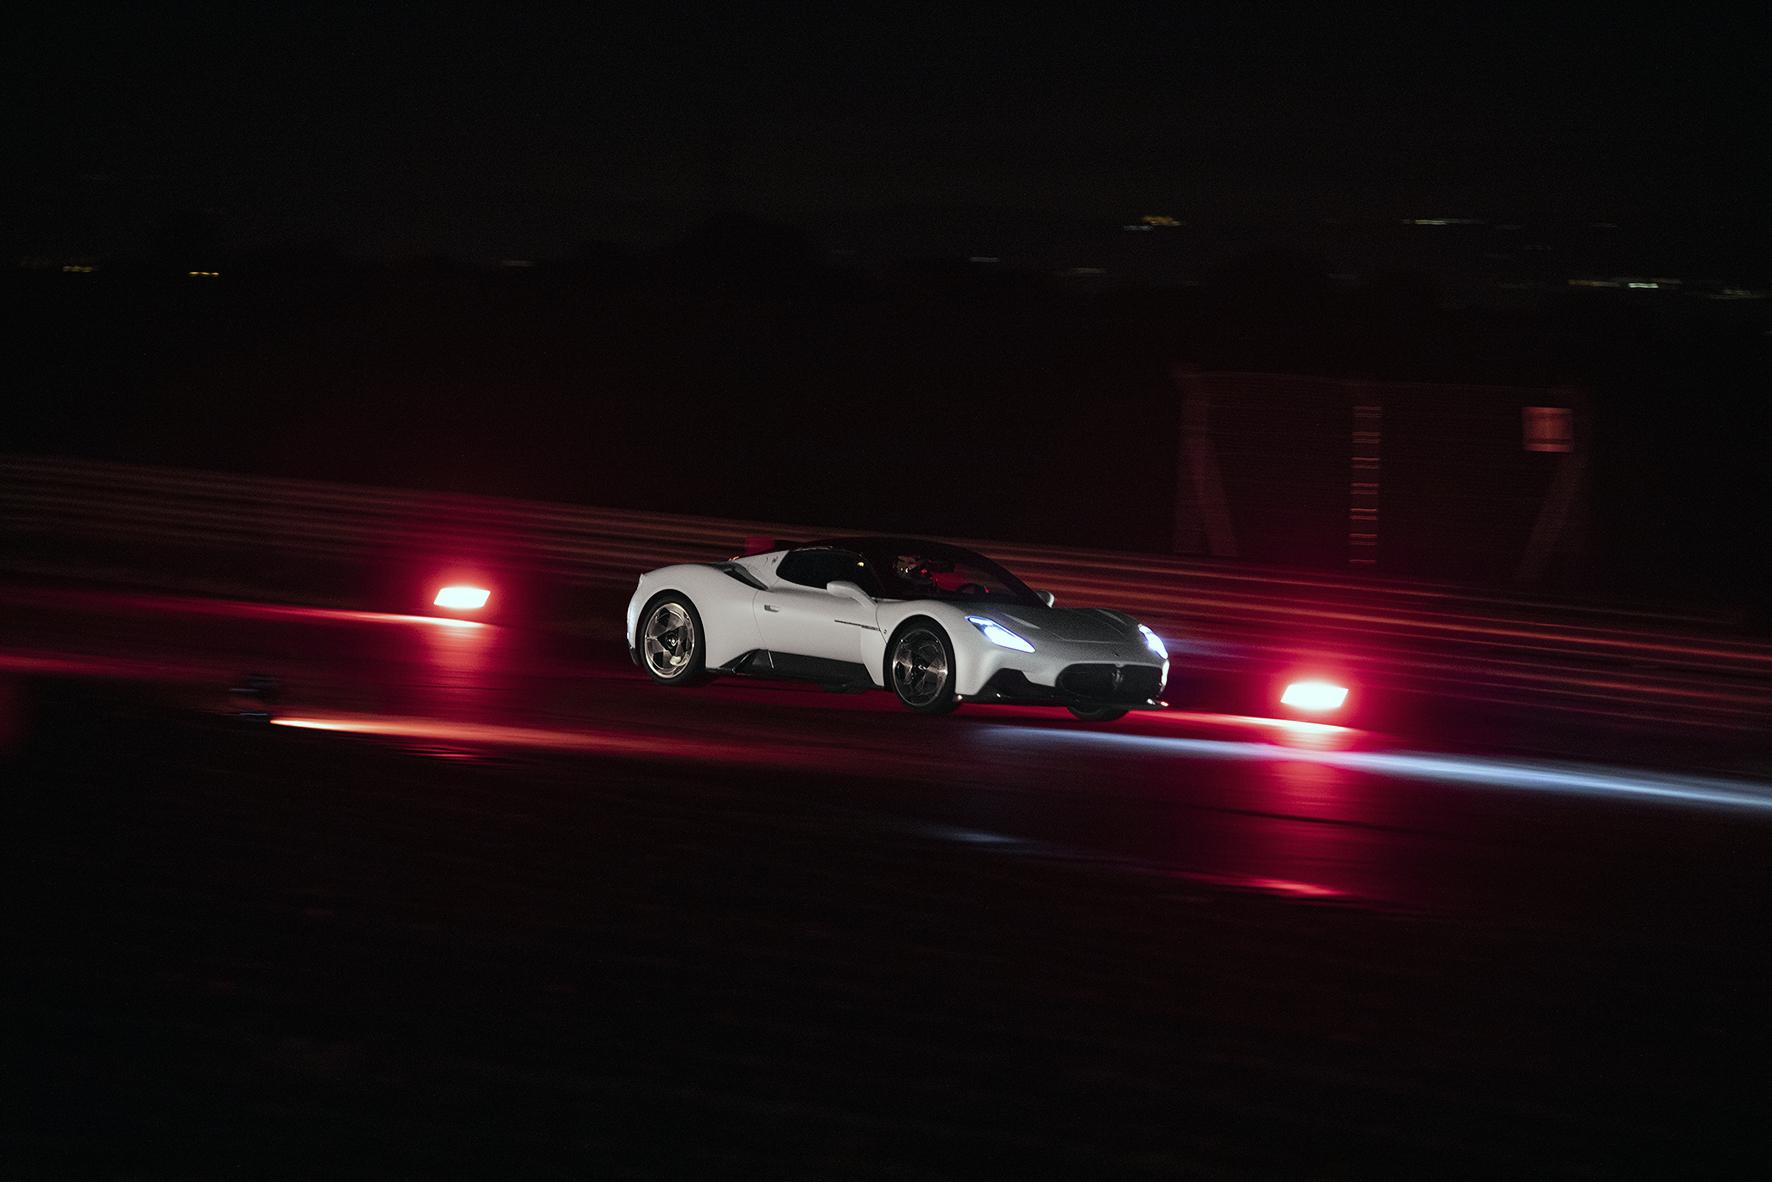 Maserati MC20 driving night time